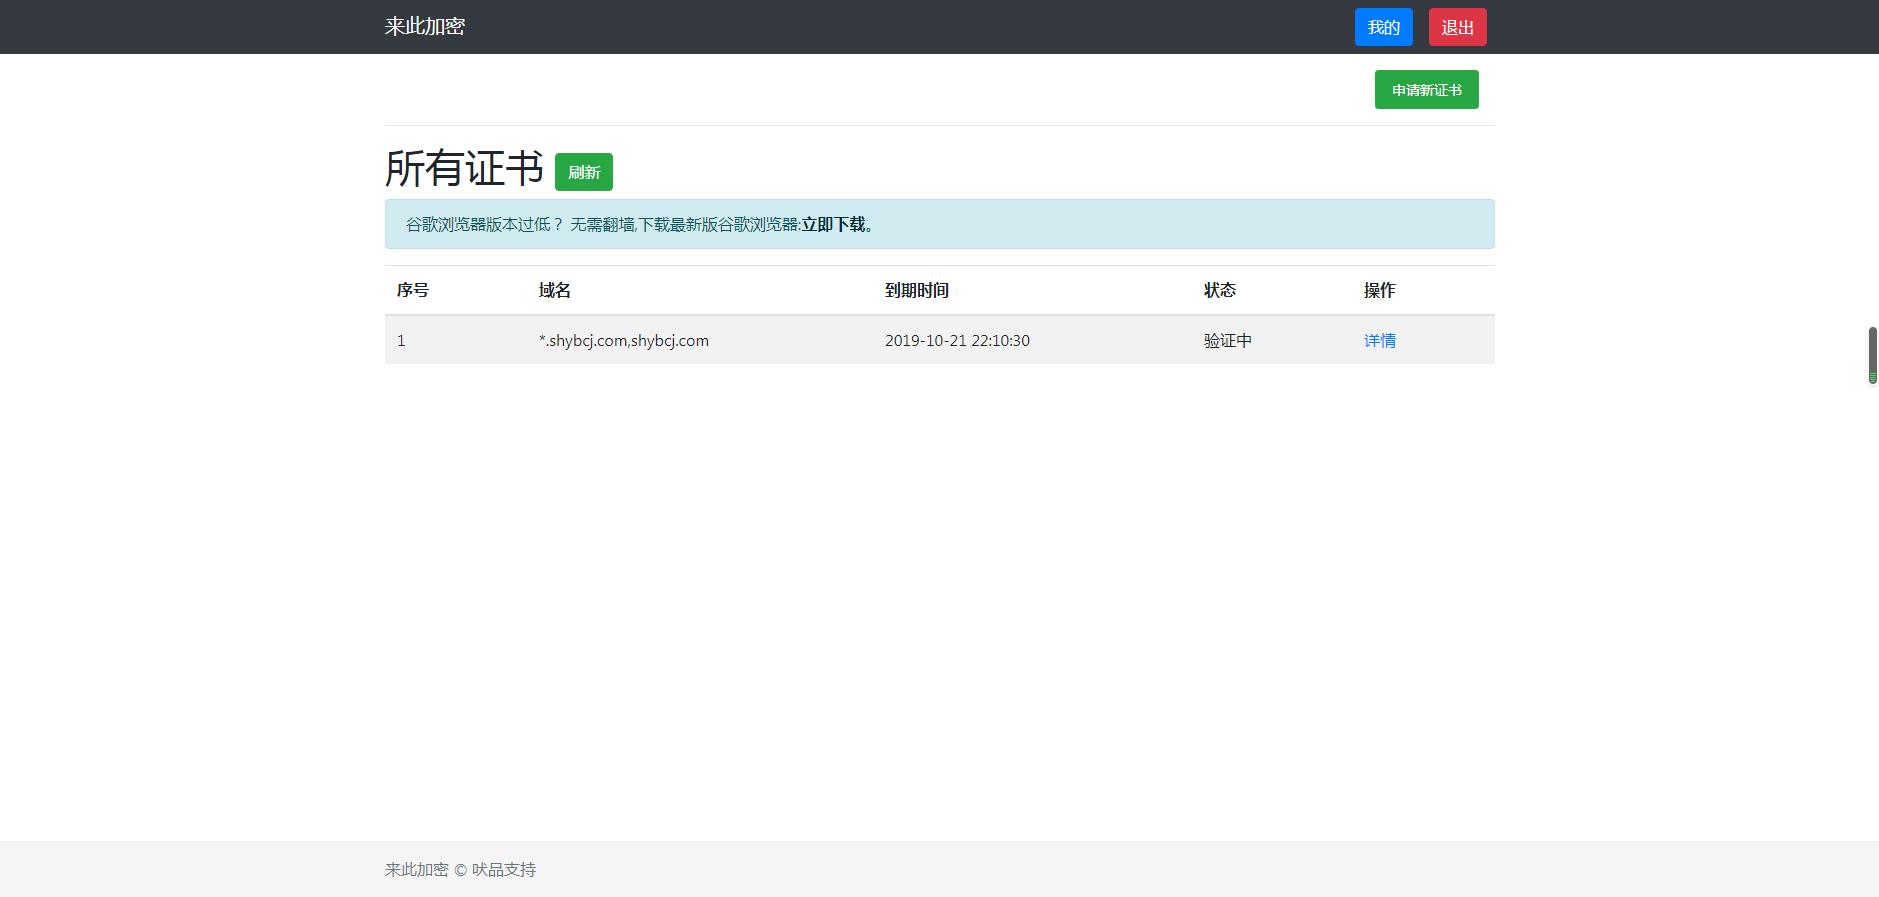 QQ图片20191015062204.png 免费通配符证书/免费SSL泛域名证书(Let's Encrypt)在线申请和续期方法 第2张